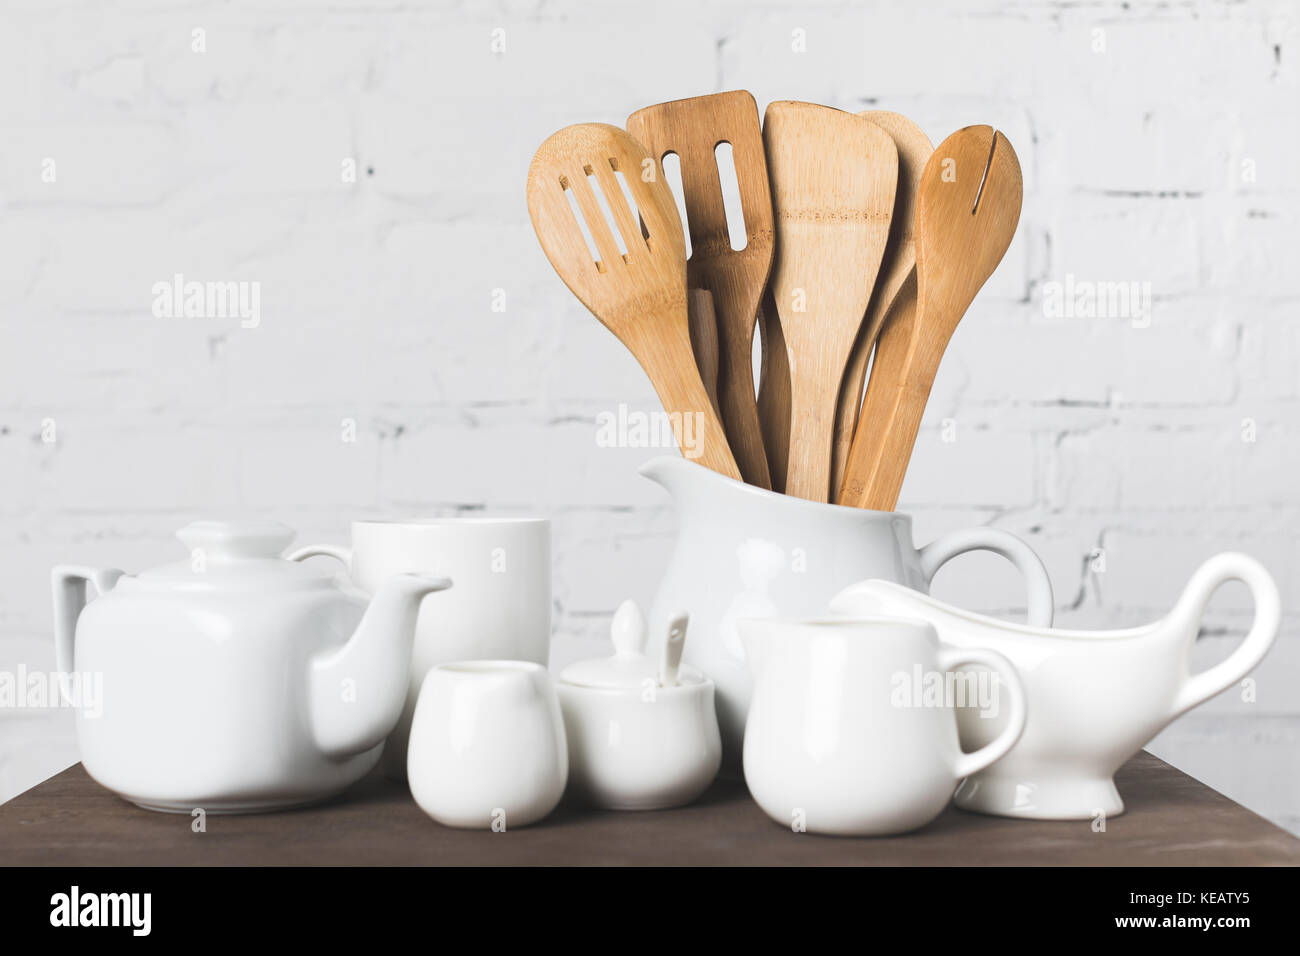 wooden kitchen utensils - Stock Image